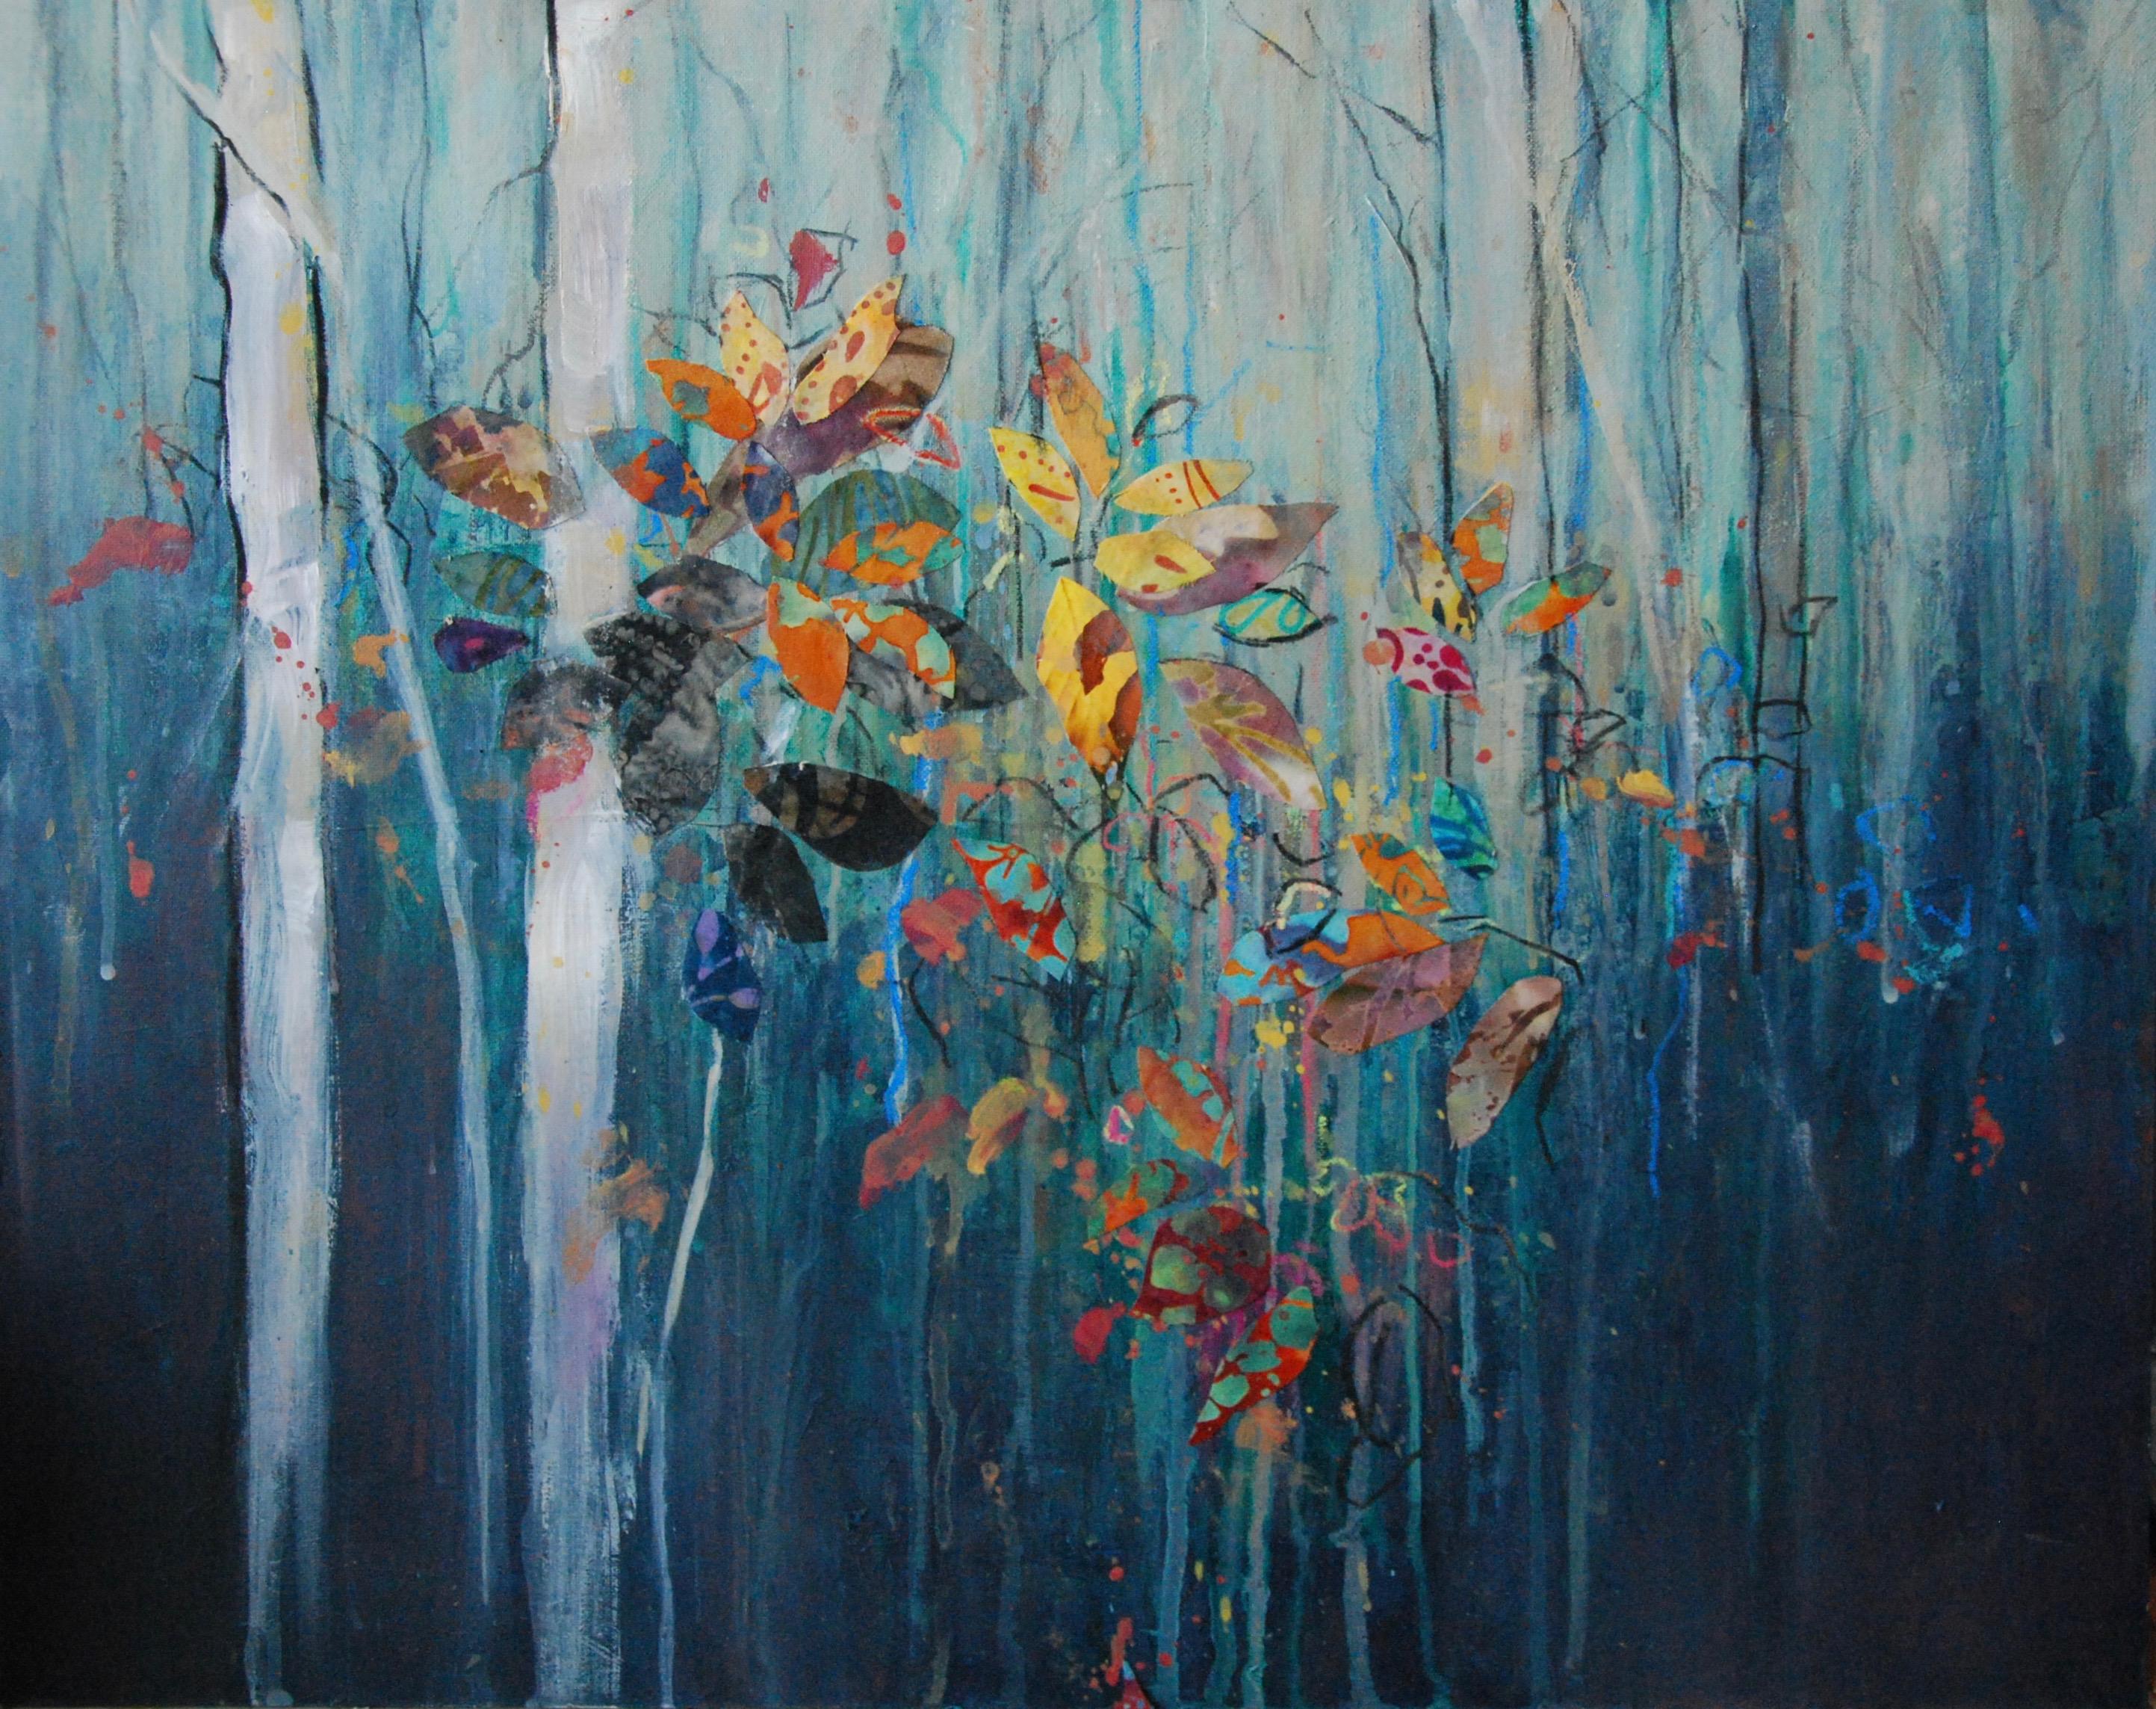 'Autumn Leaves' Anna Perlin Mixed media, 40cm x 50cm, 2016